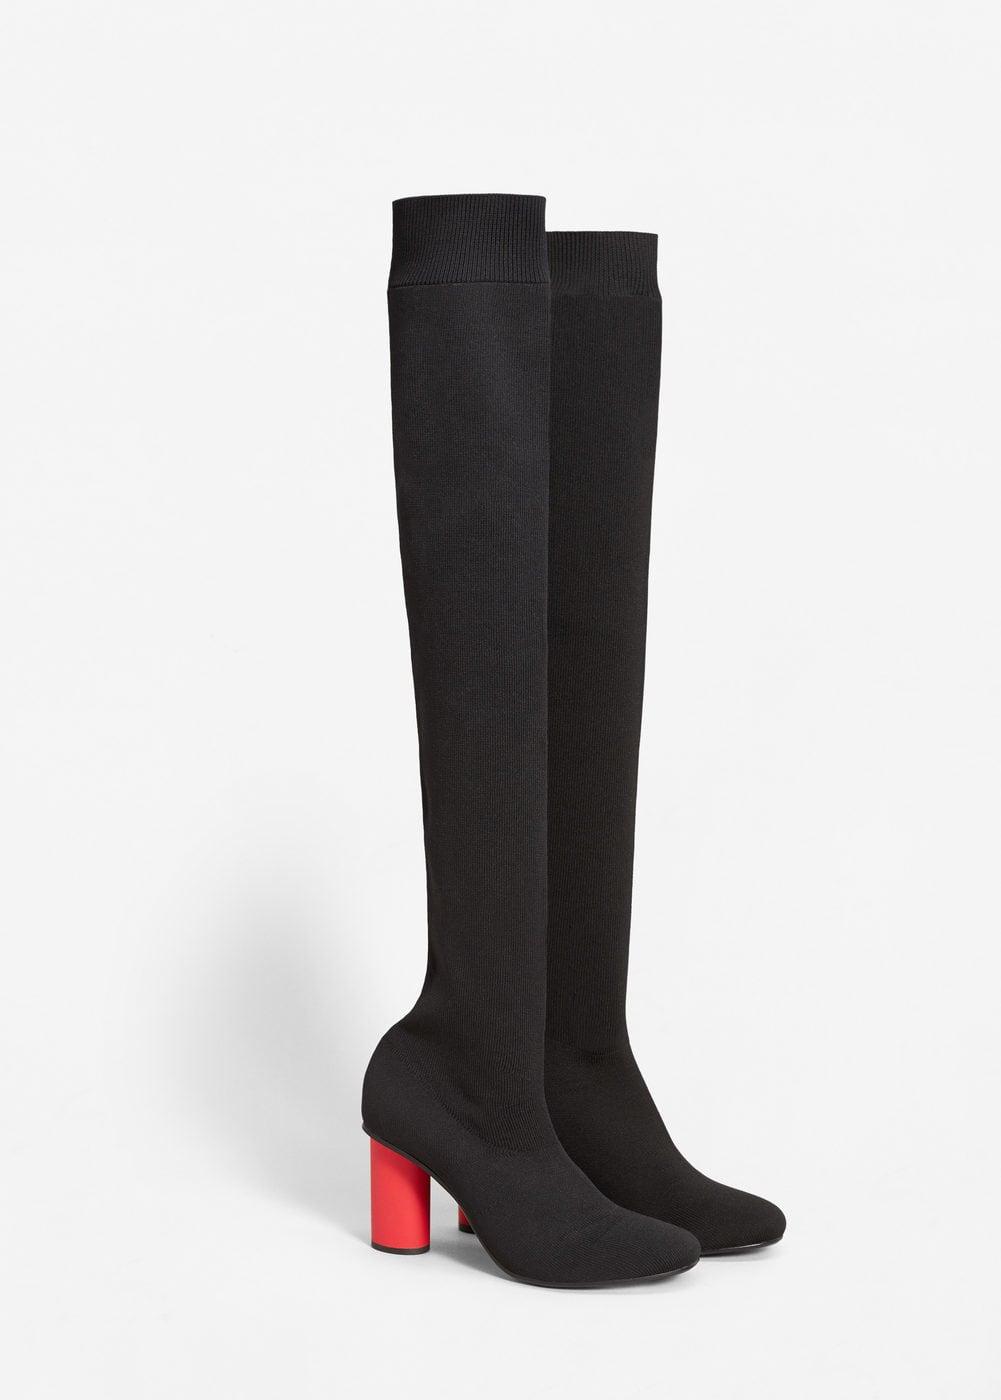 Botas altas negras con rojo